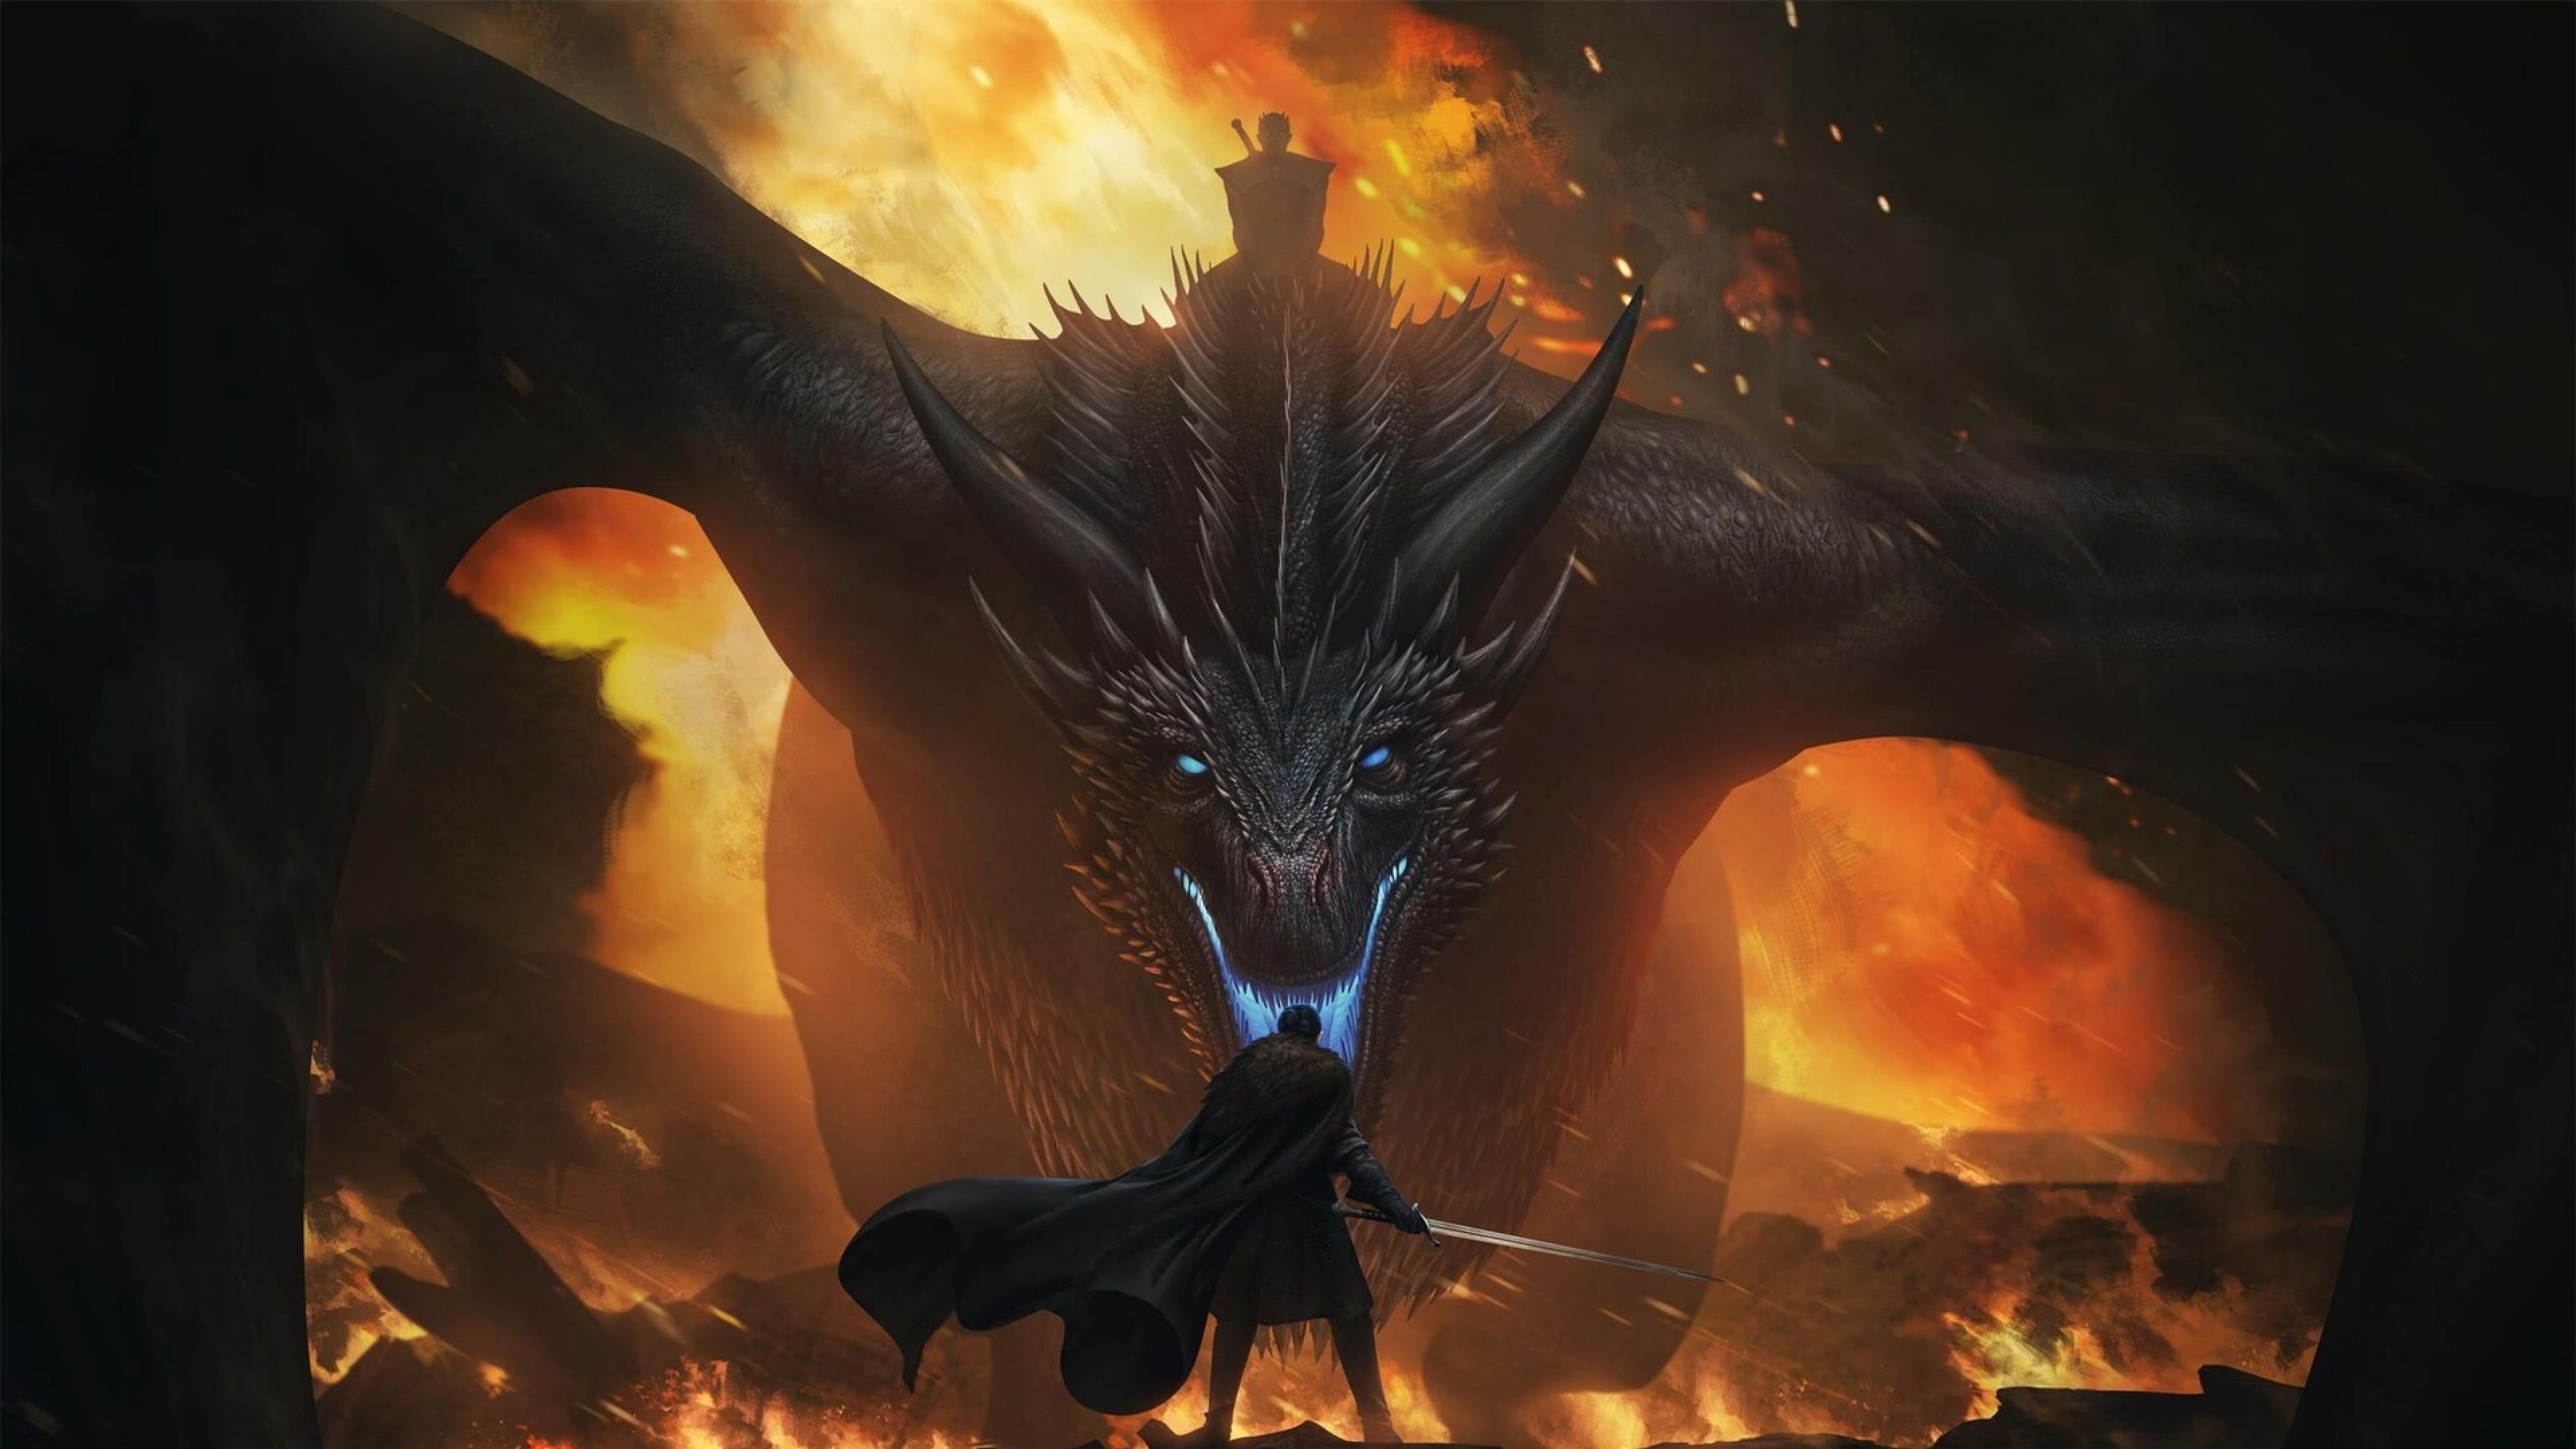 3840x2160 Jon Snow Vs Night King Dragon 4K Wallpaper, HD ...